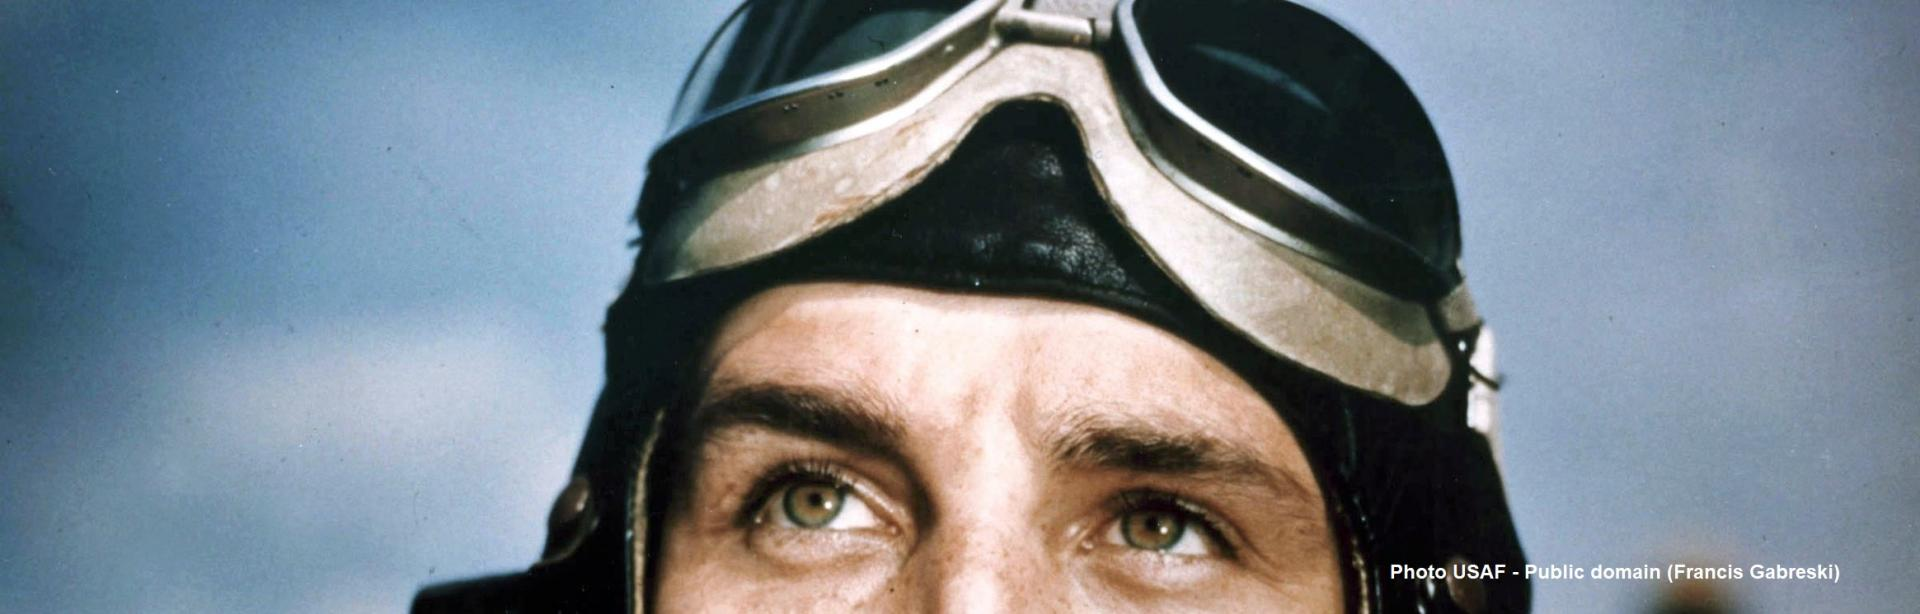 hommes de l'air - airmen